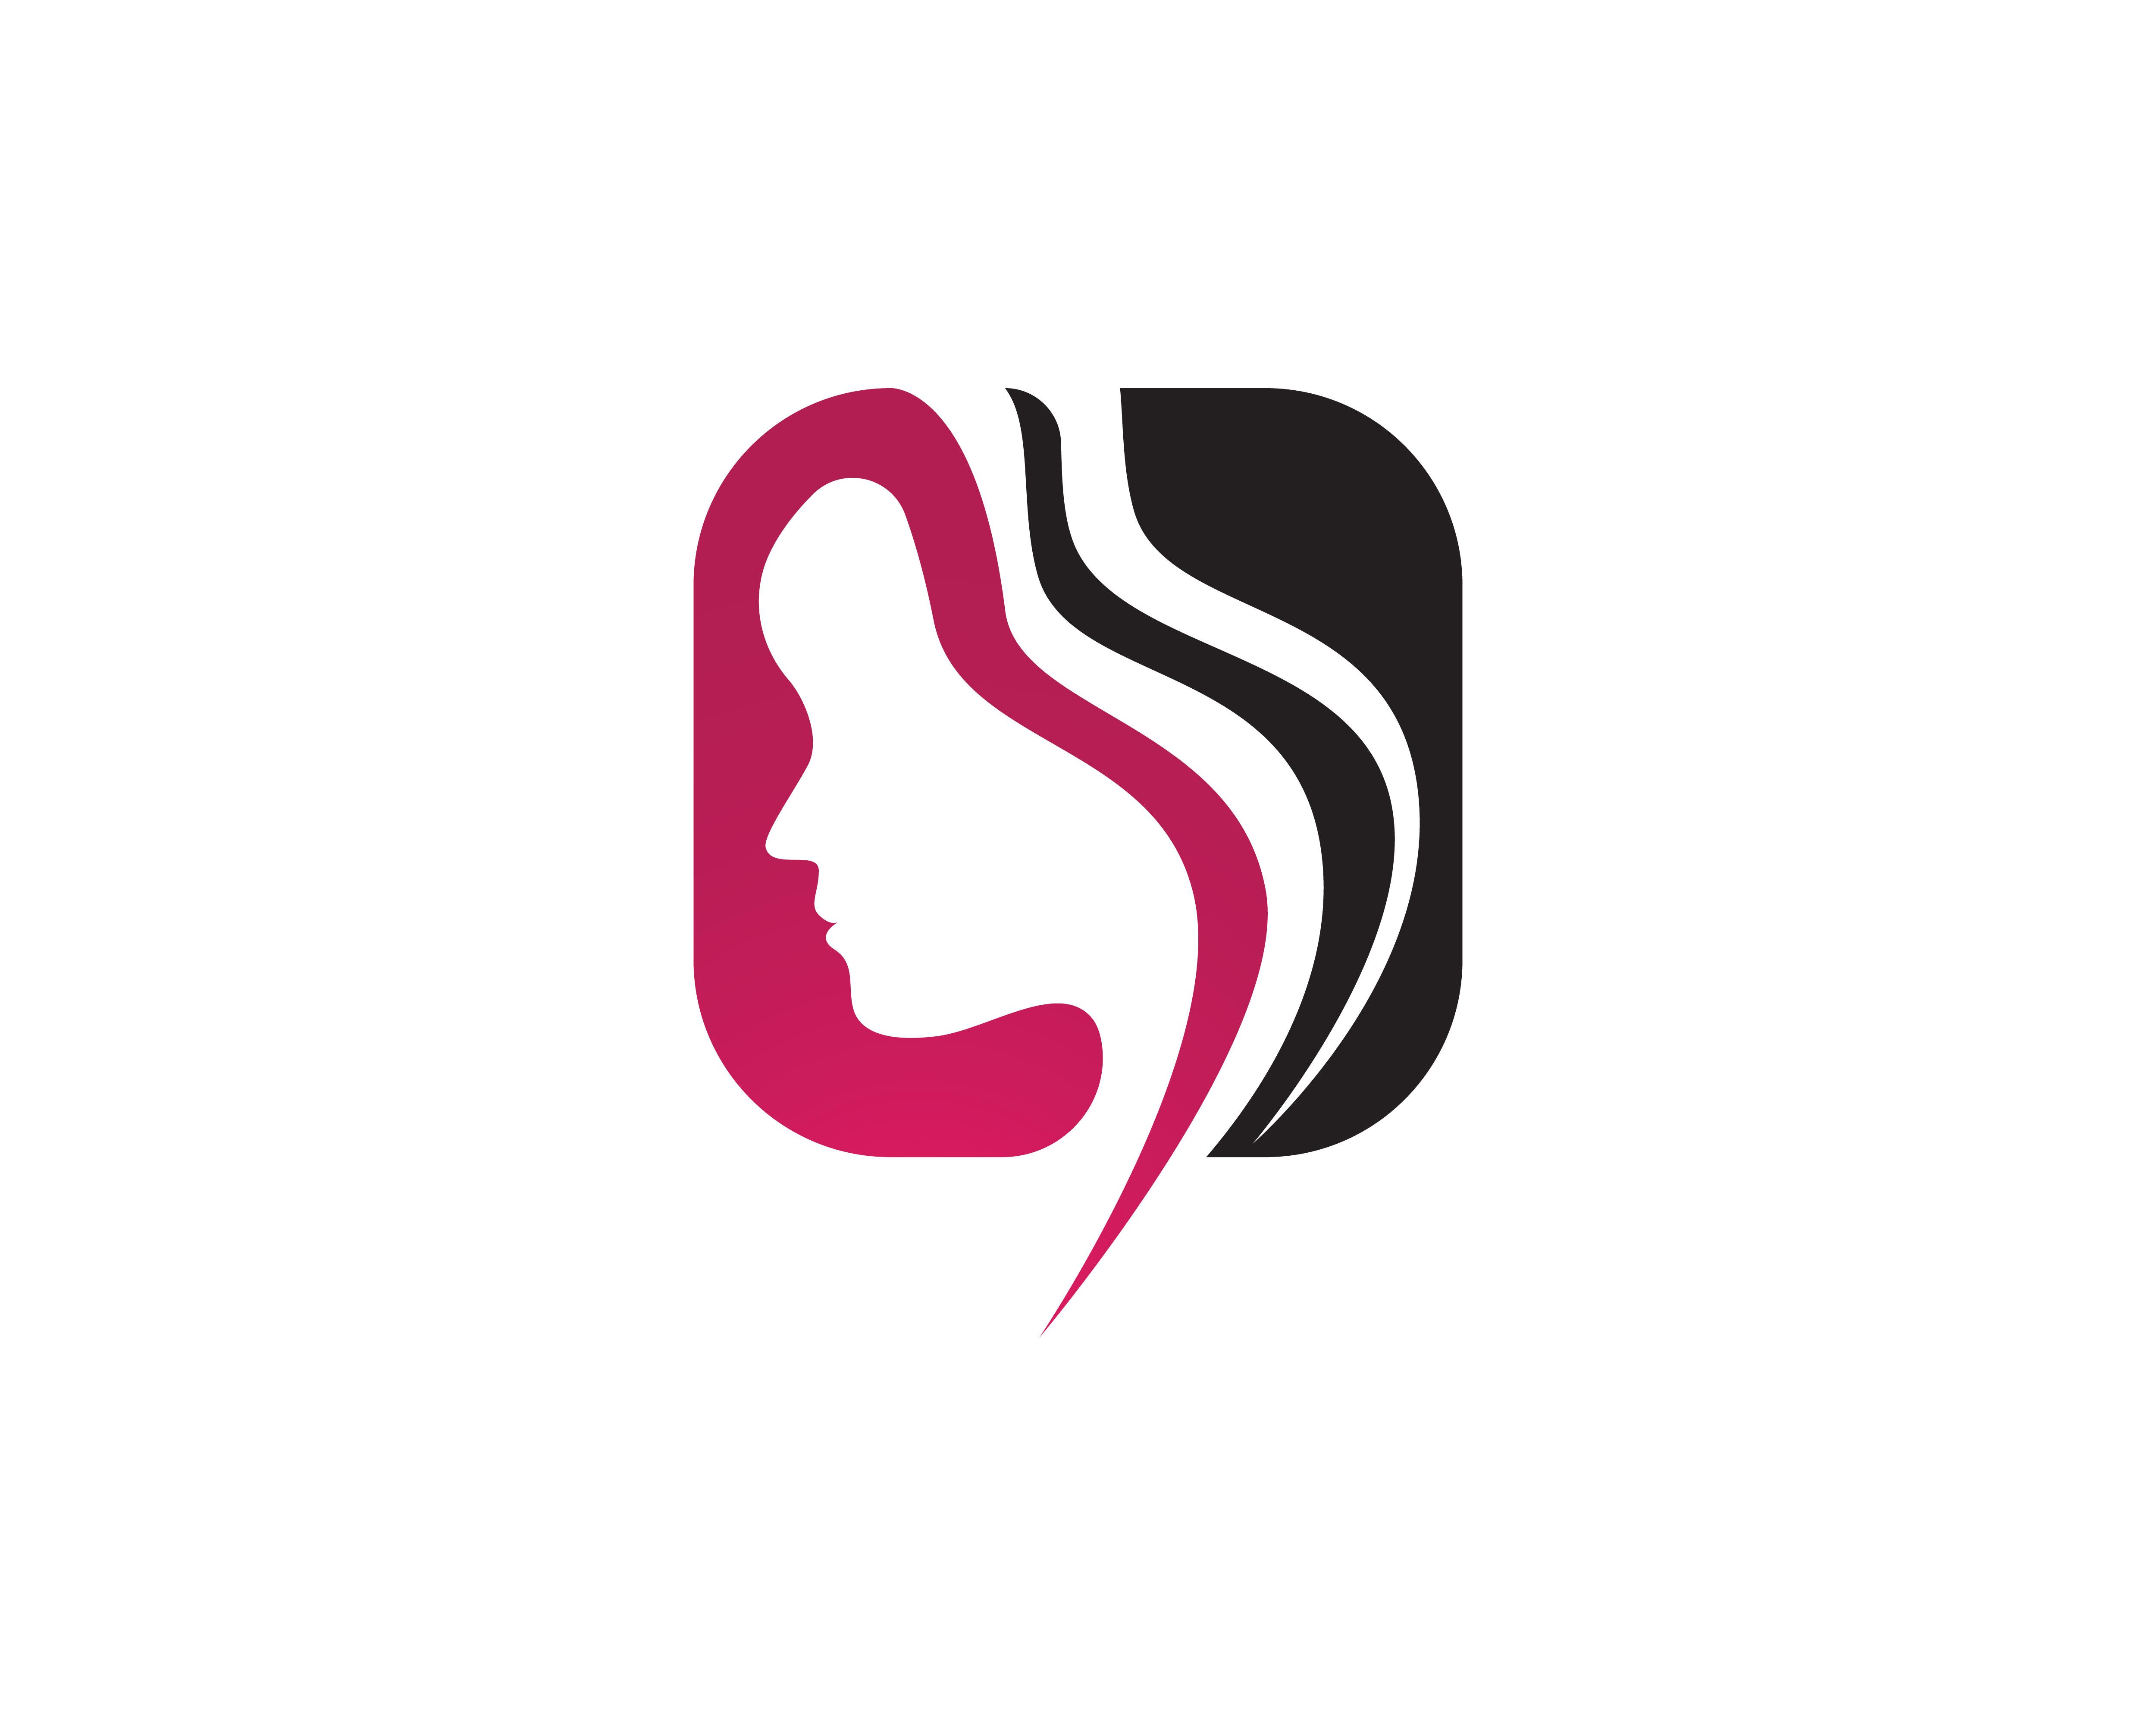 Beauty Face Hair Logo Women Download Free Vectors Clipart Graphics Vector Art